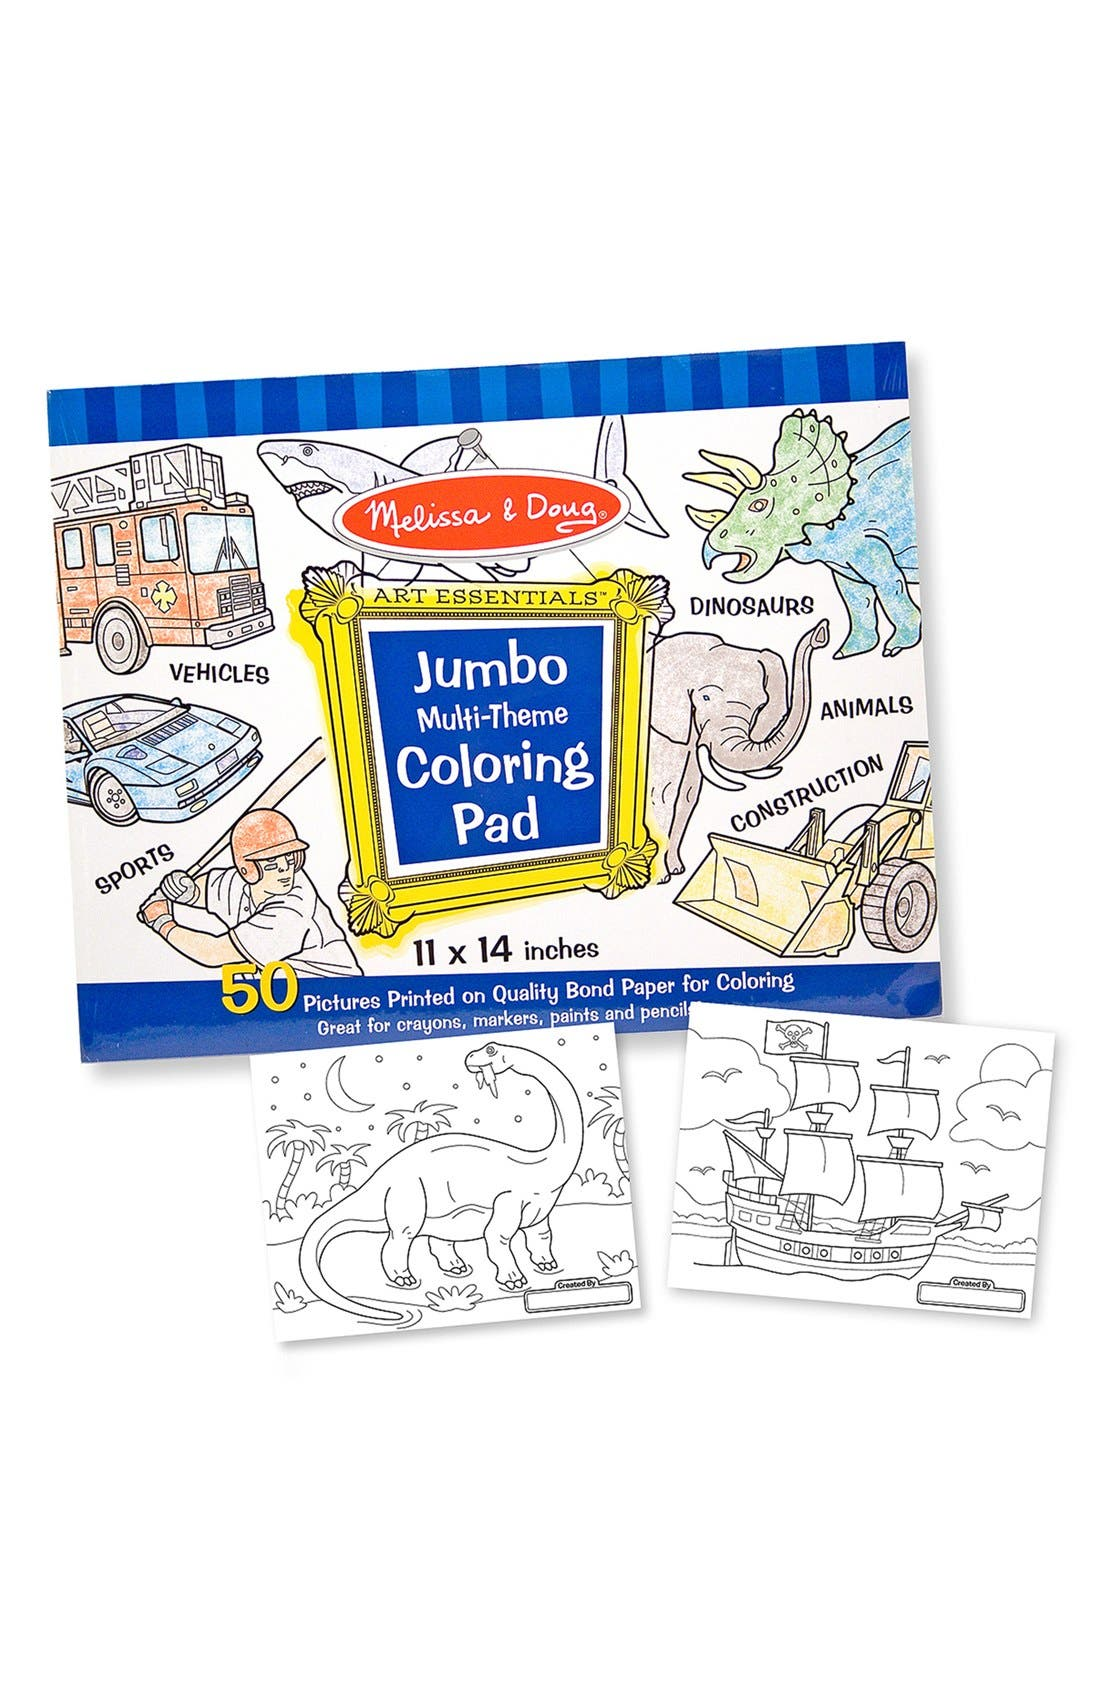 Alternate Image 1 Selected - Melissa & Doug 'Jumbo' Multi Theme Coloring Pad